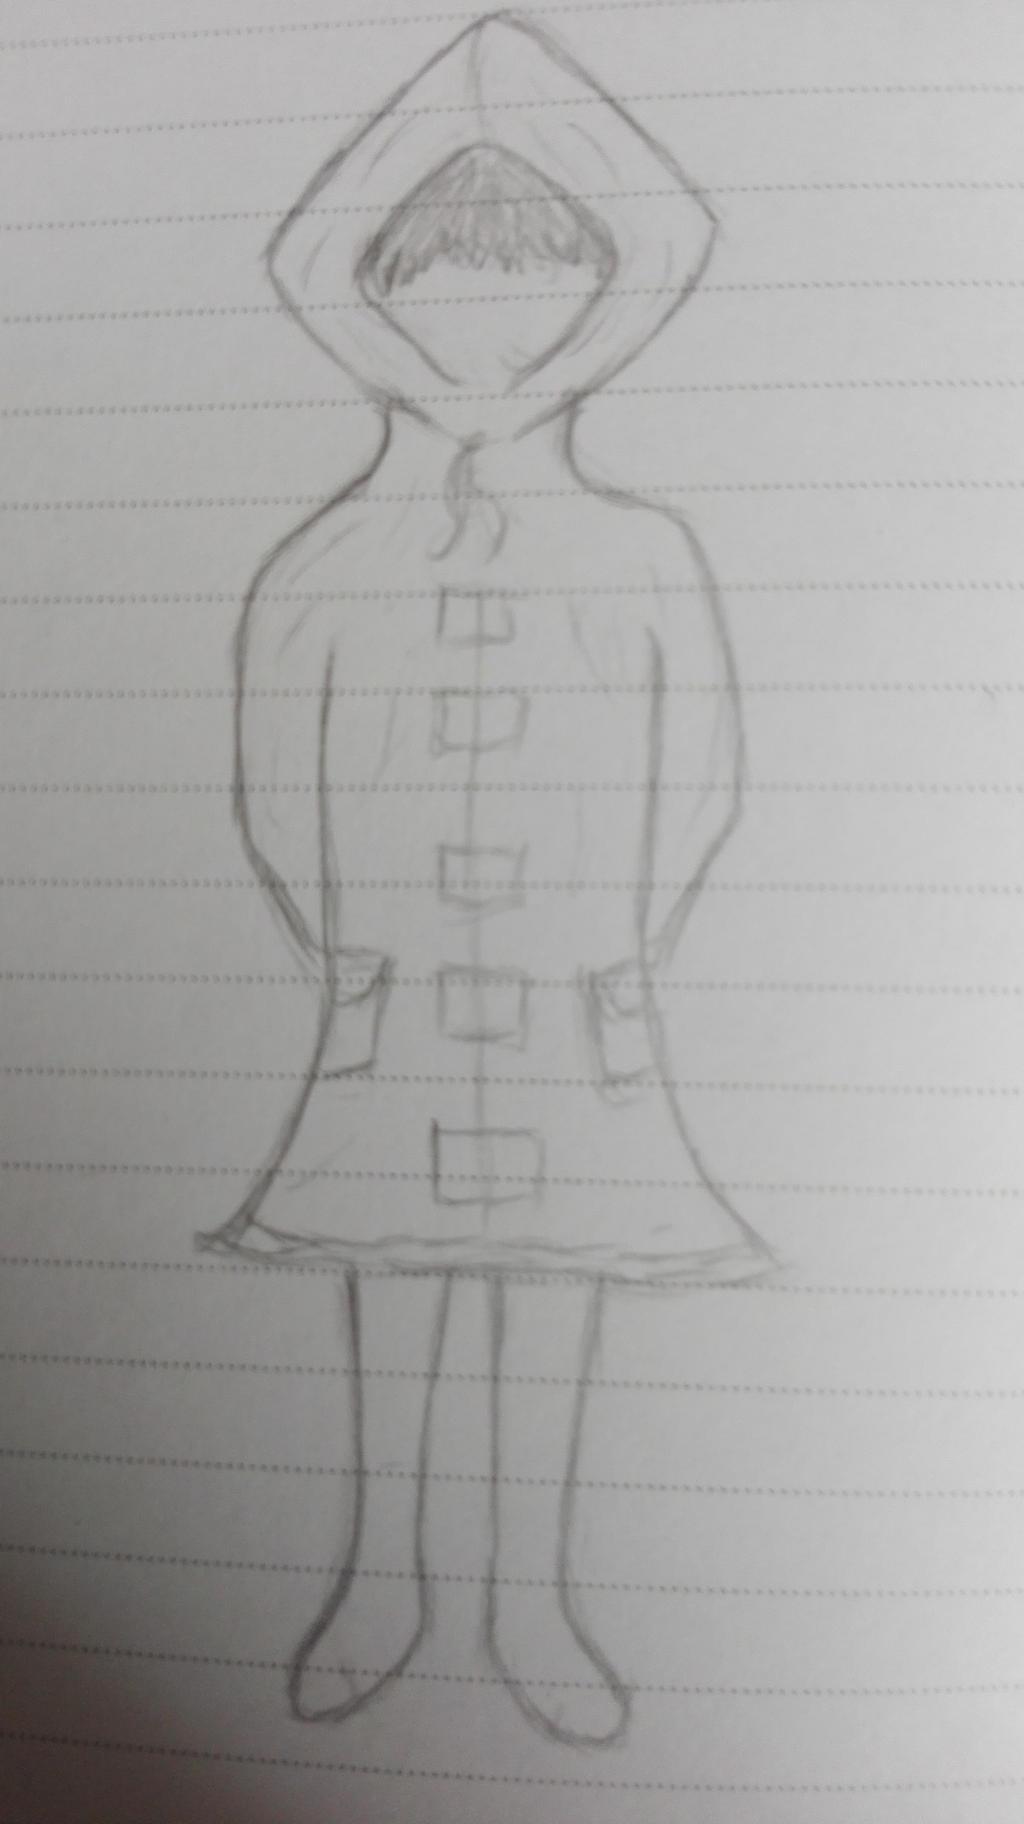 Little Nightmares Sketch by oOFrosteehOo